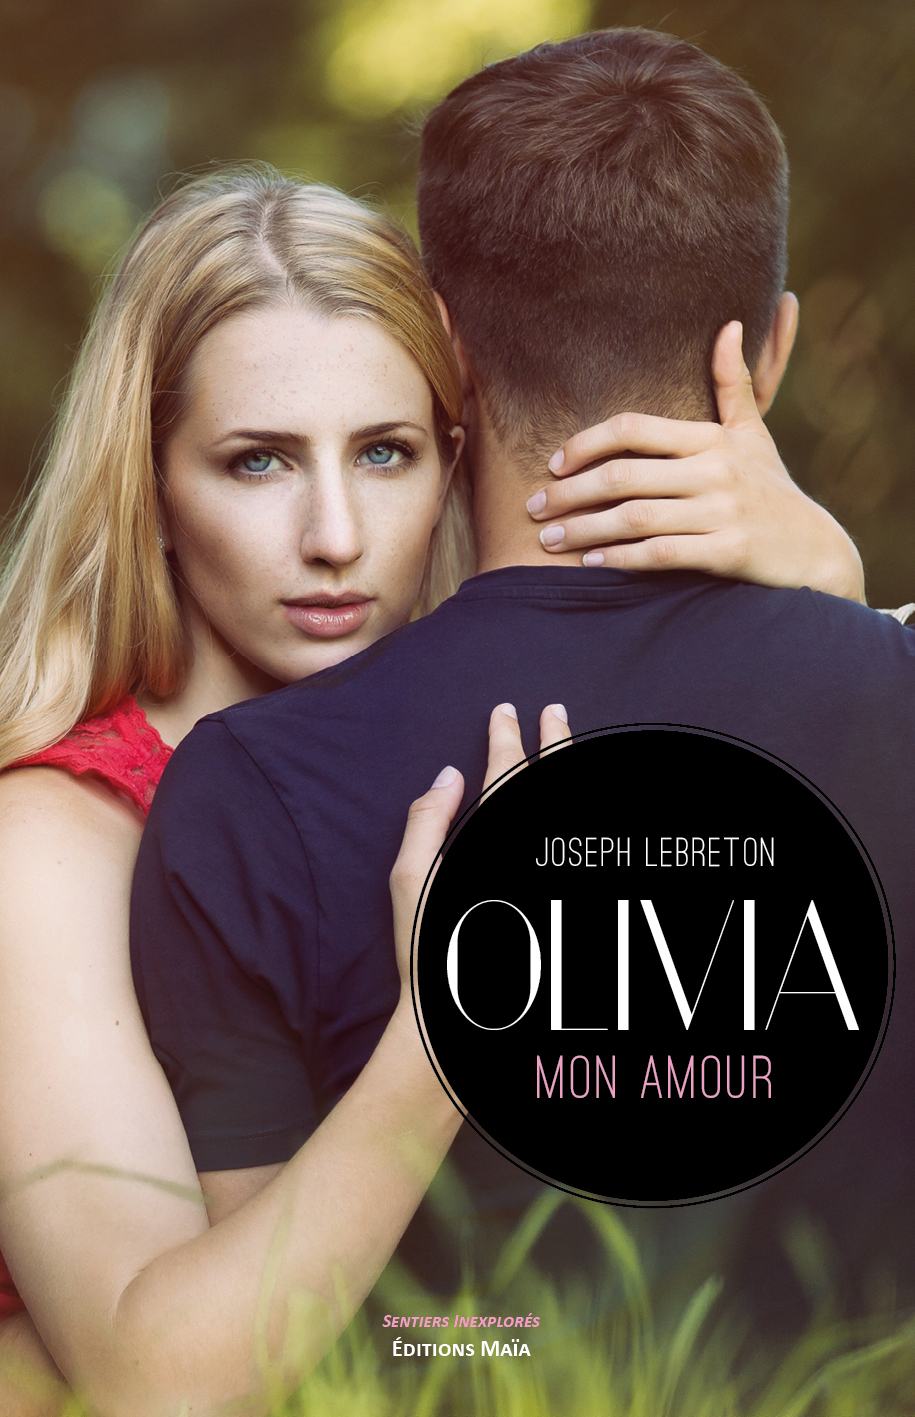 Entretien avec Joseph Lebreton – Olivia mon amour